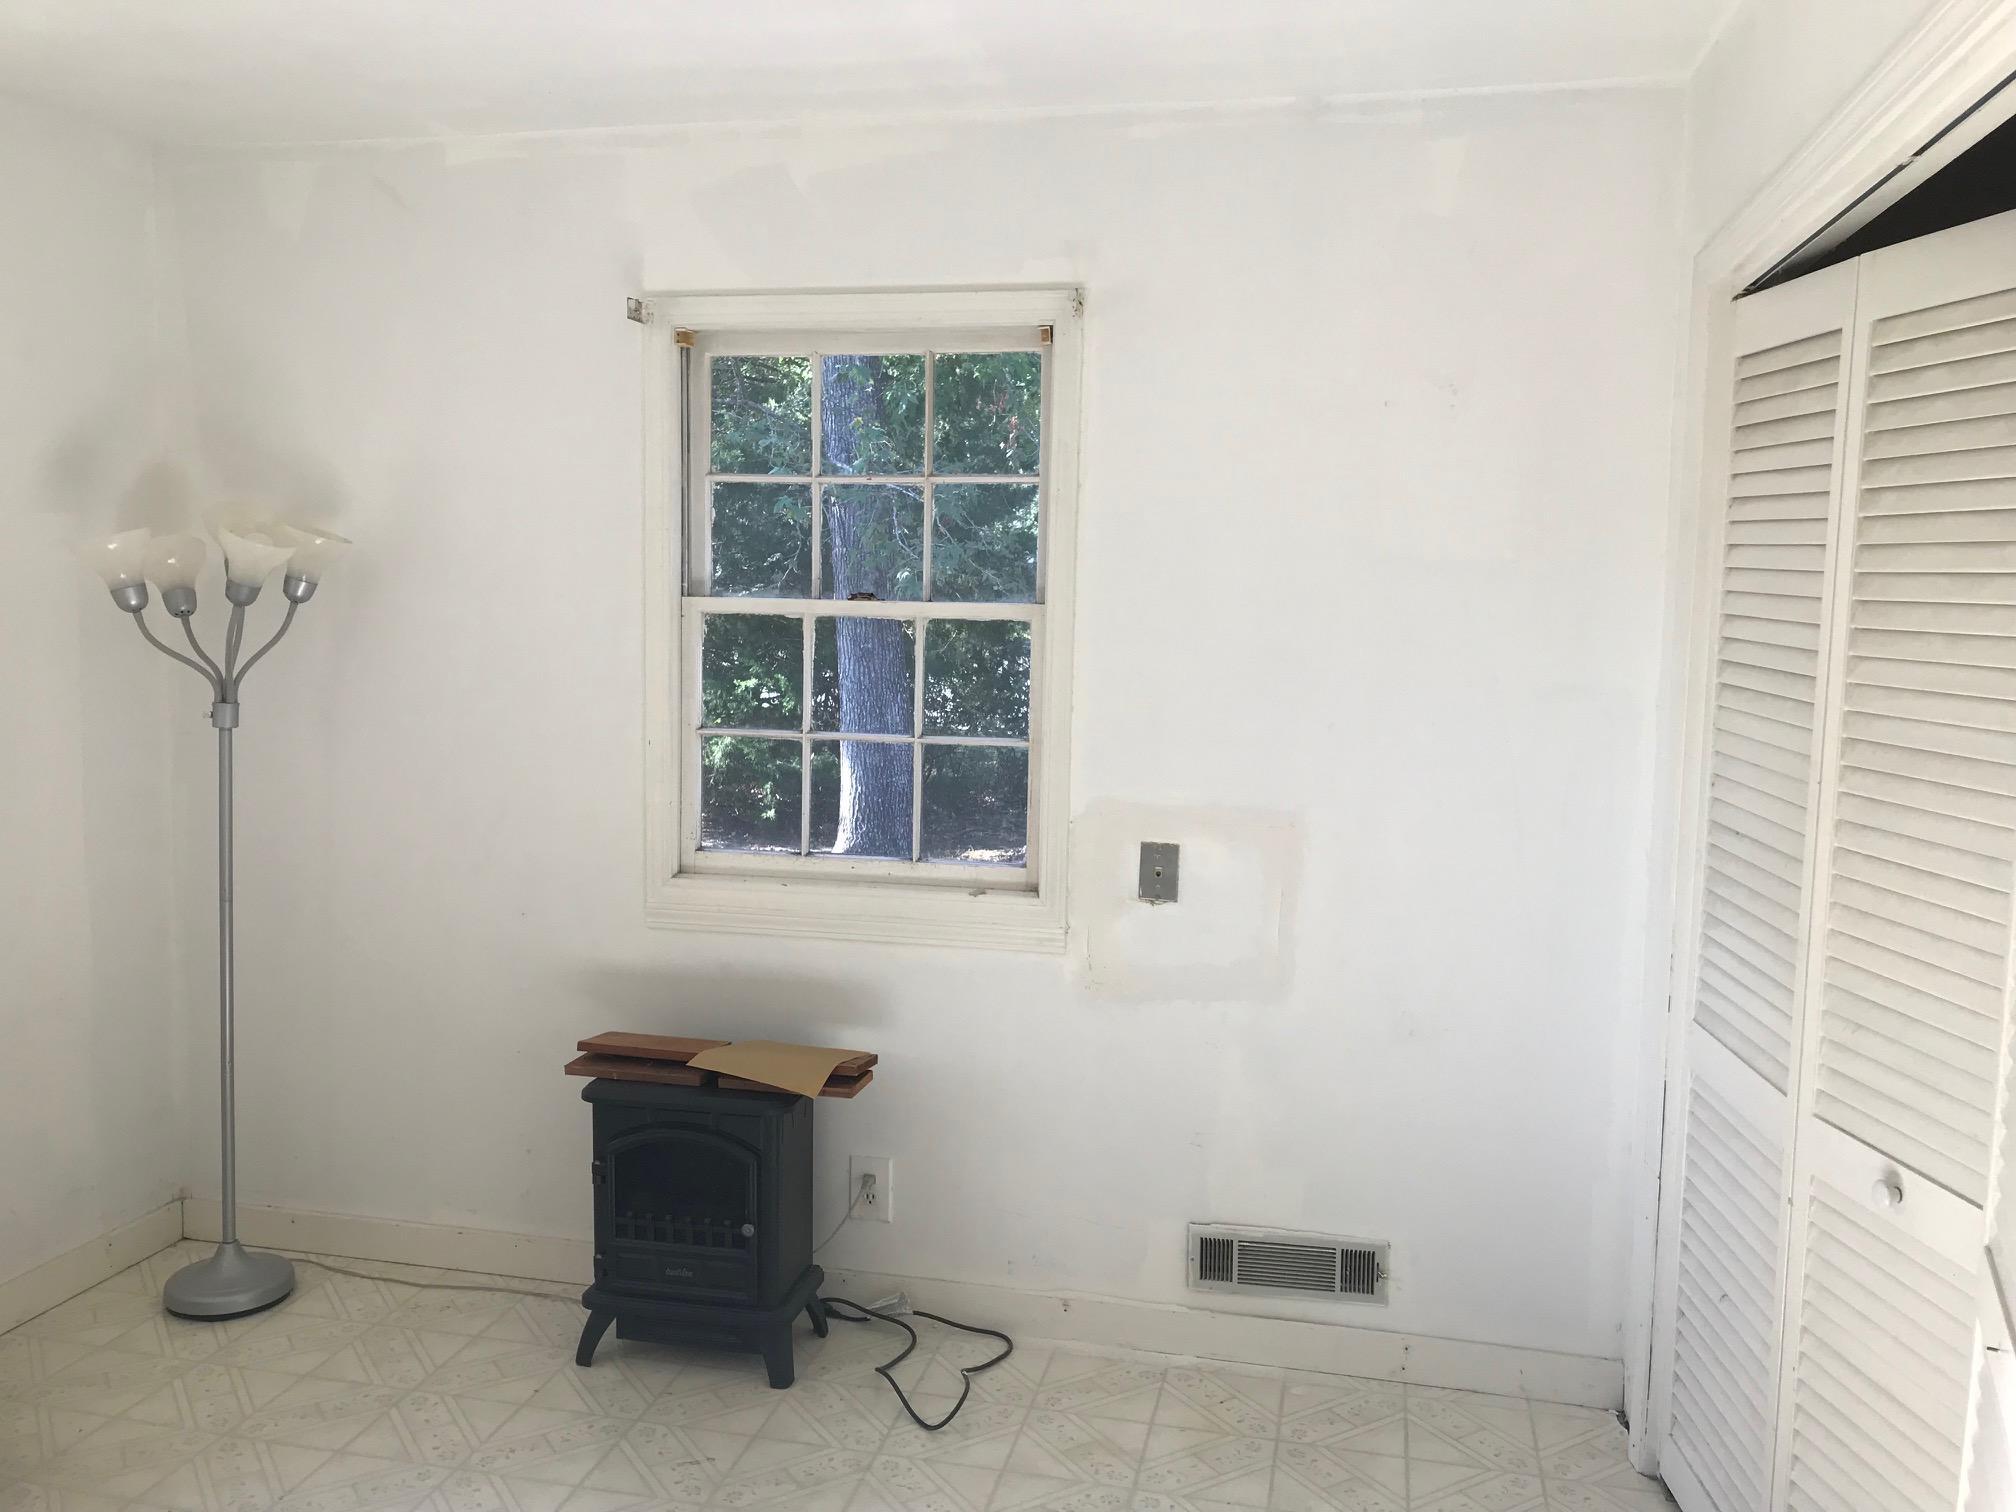 Northbridge Terrace Homes For Sale - 1079 Orange Grove, Charleston, SC - 9